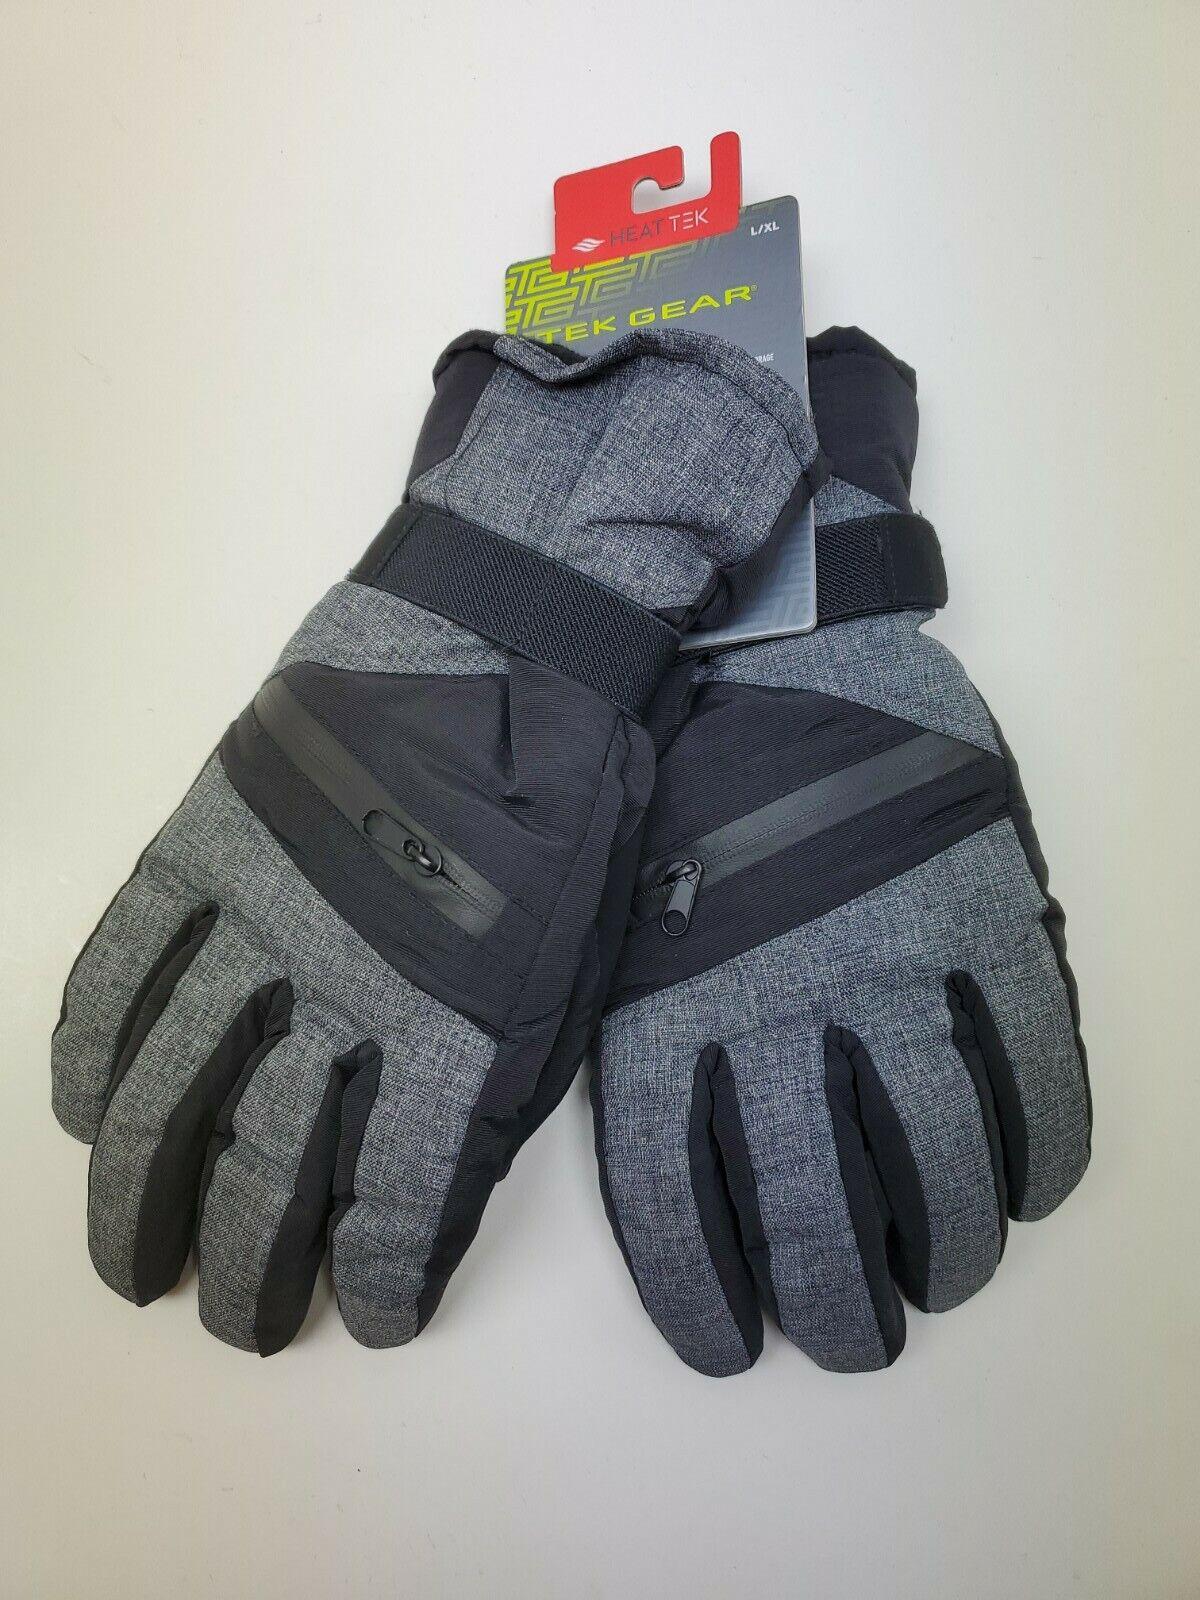 Tek Gear Mens Ski Gloves L/XL Thinsulate Storage Pocket Touch Screen Compatible